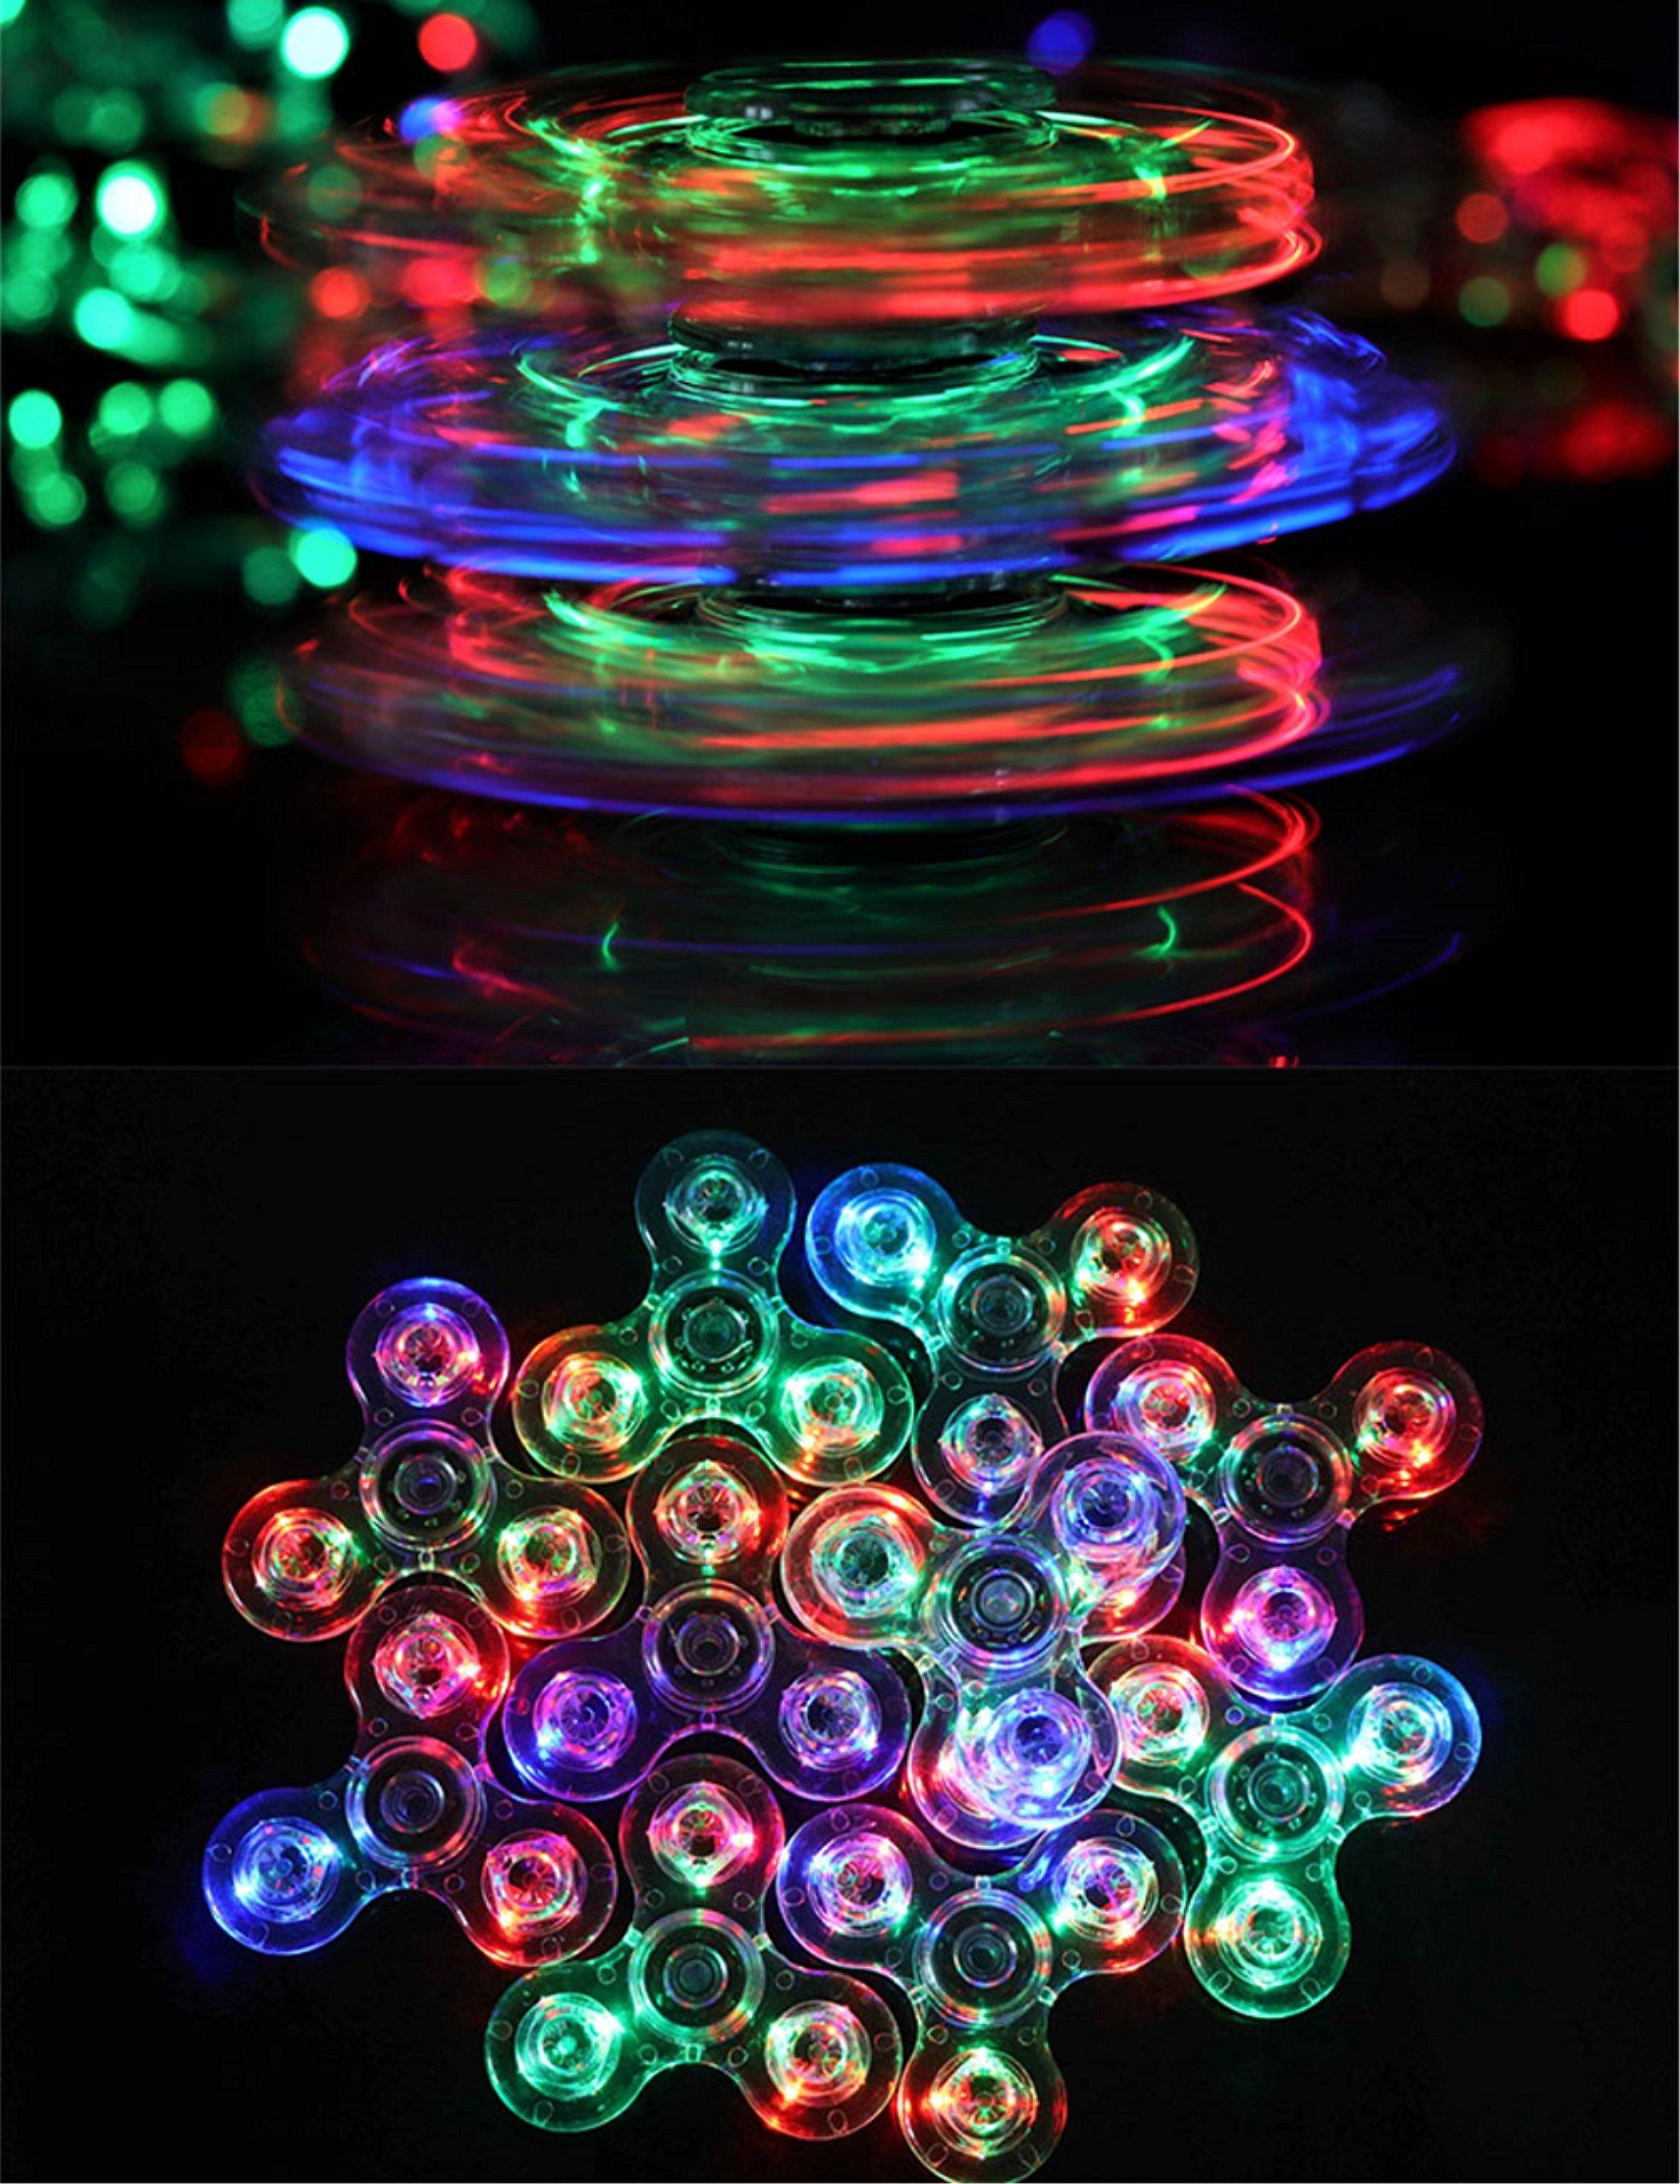 FIGROL Fidget Spinner, Clear Fidget Toy, Crystal Led Light Rainbow Toy Finger Hand Spinner-Kids(Crystal)